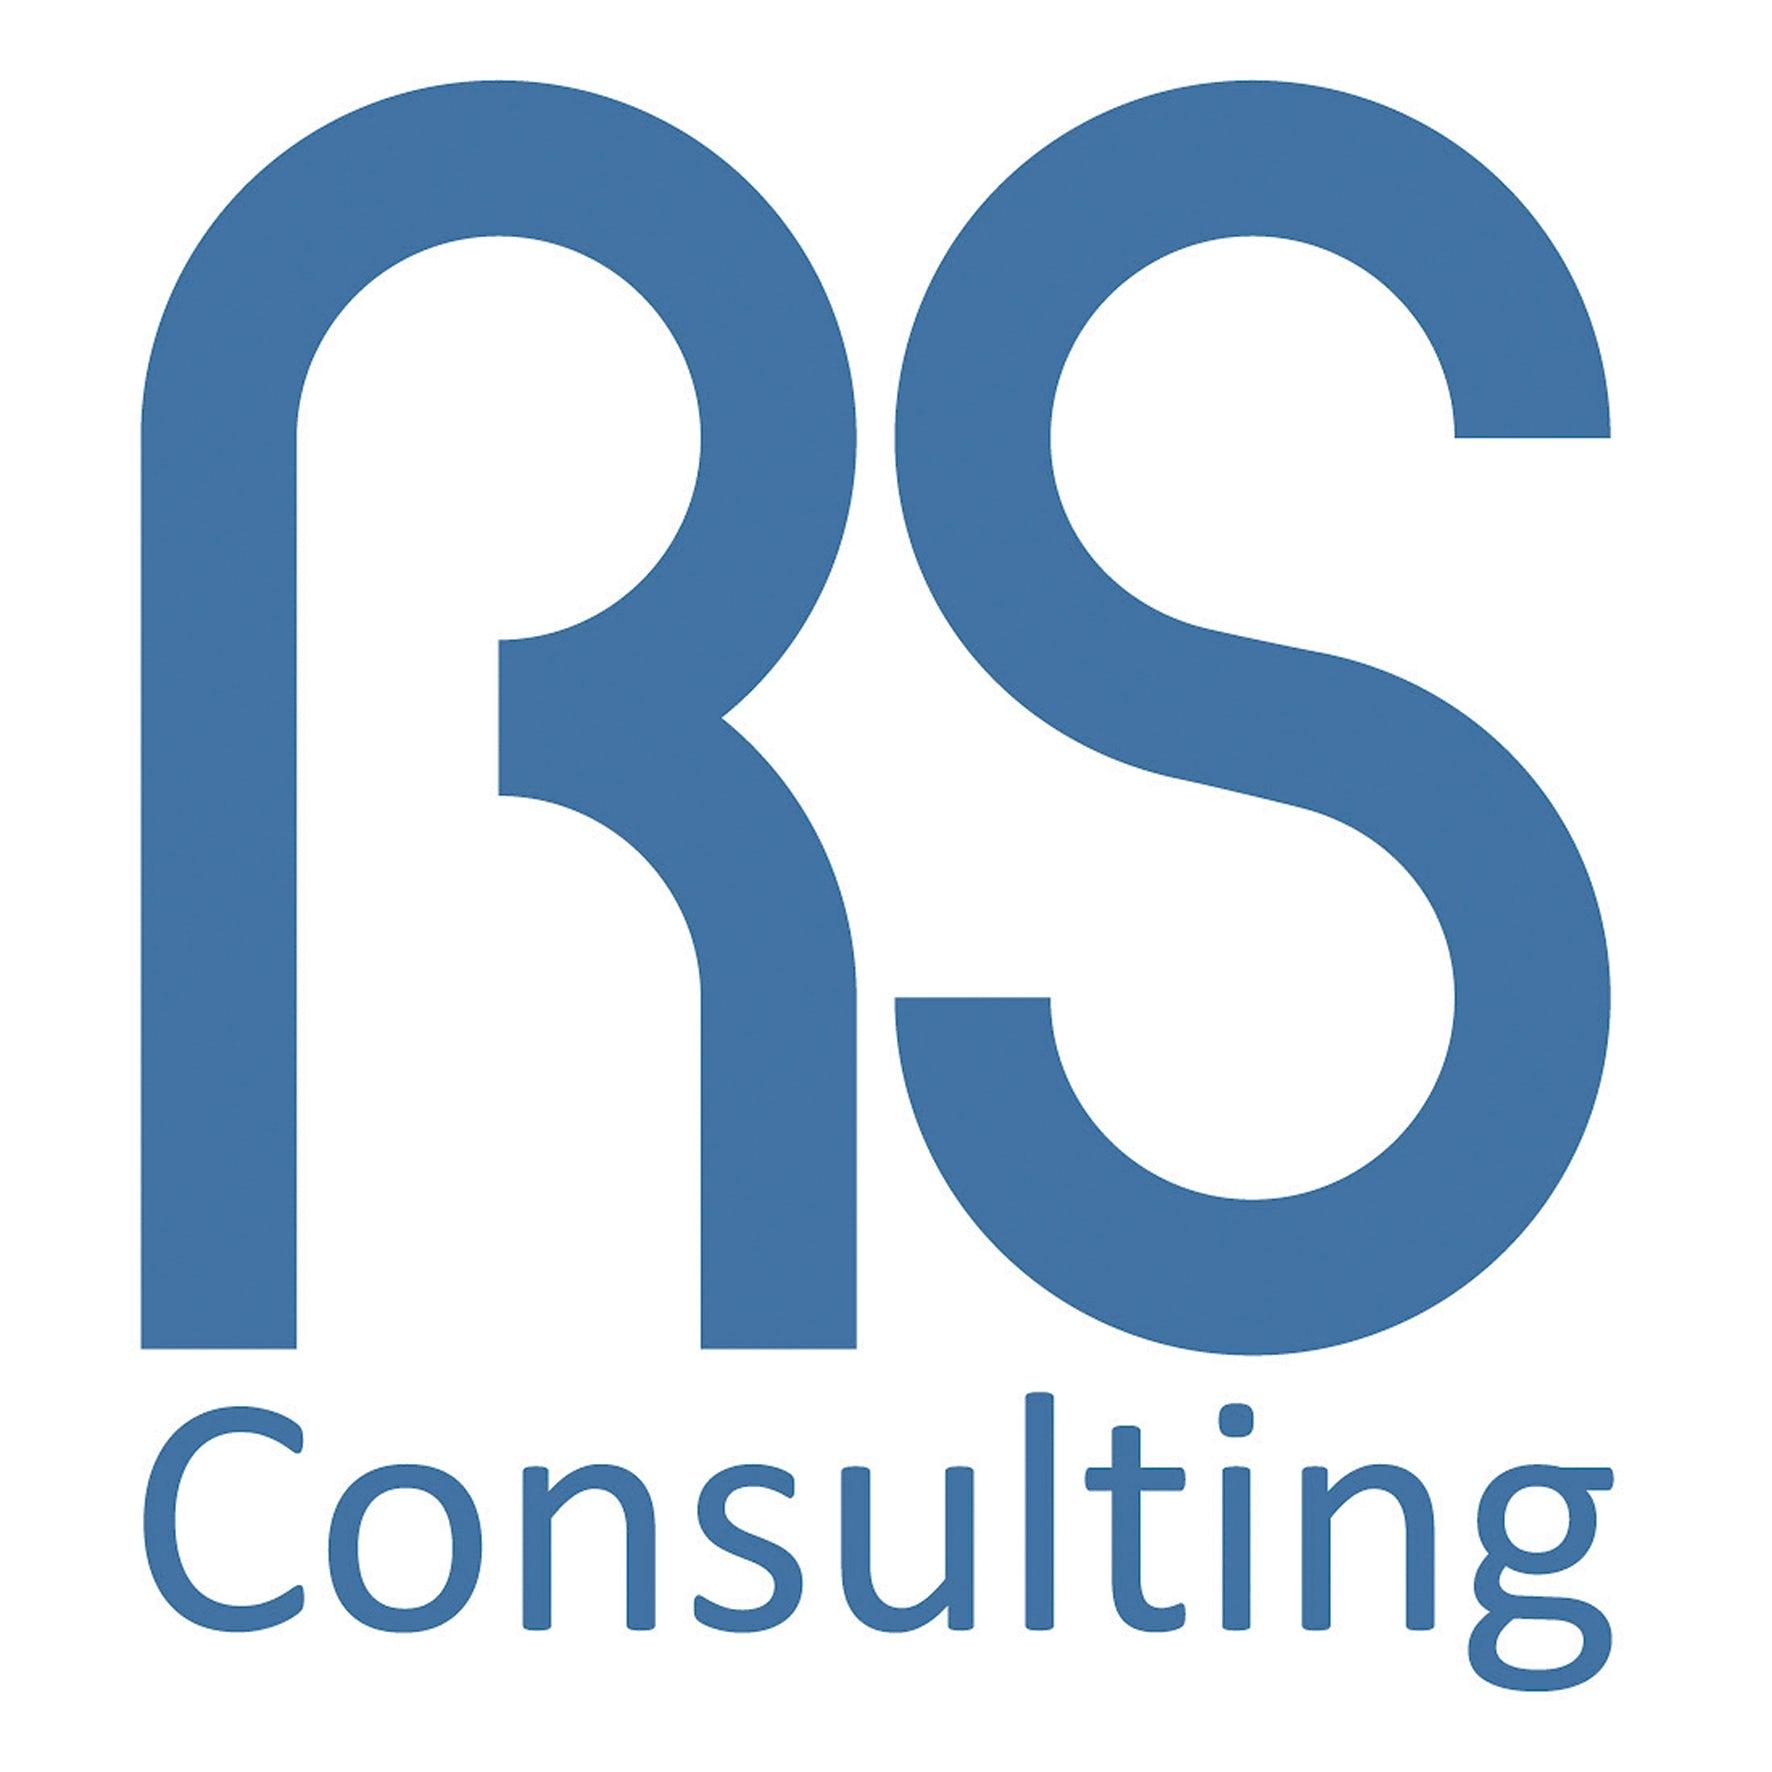 /j/c/b/RS_Consulting_cmyk.jpg